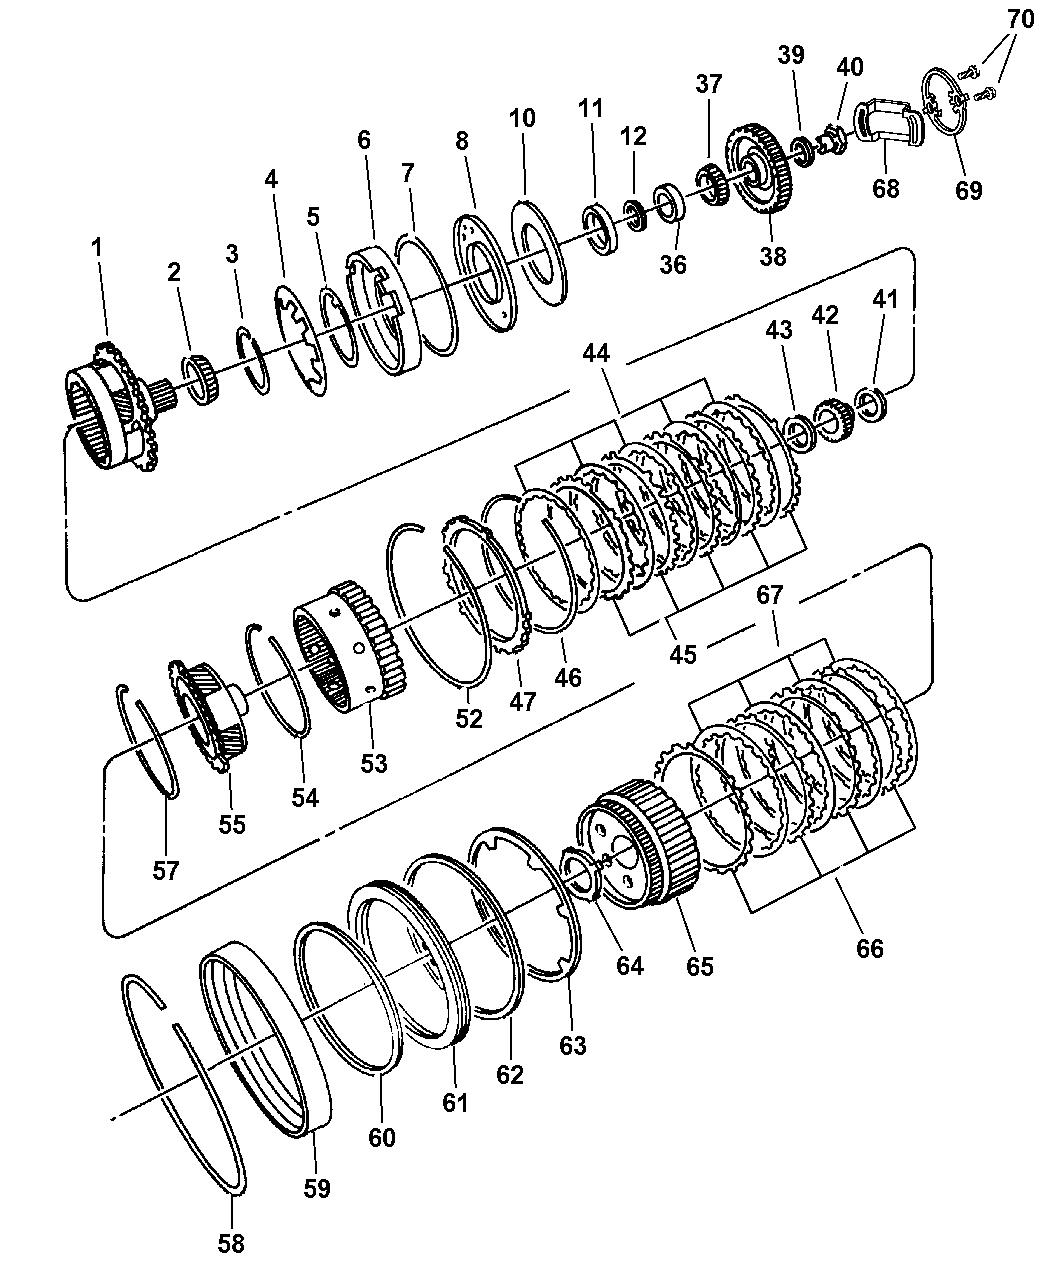 1998 Dodge Stratus Gear Train of Automatic Transmission